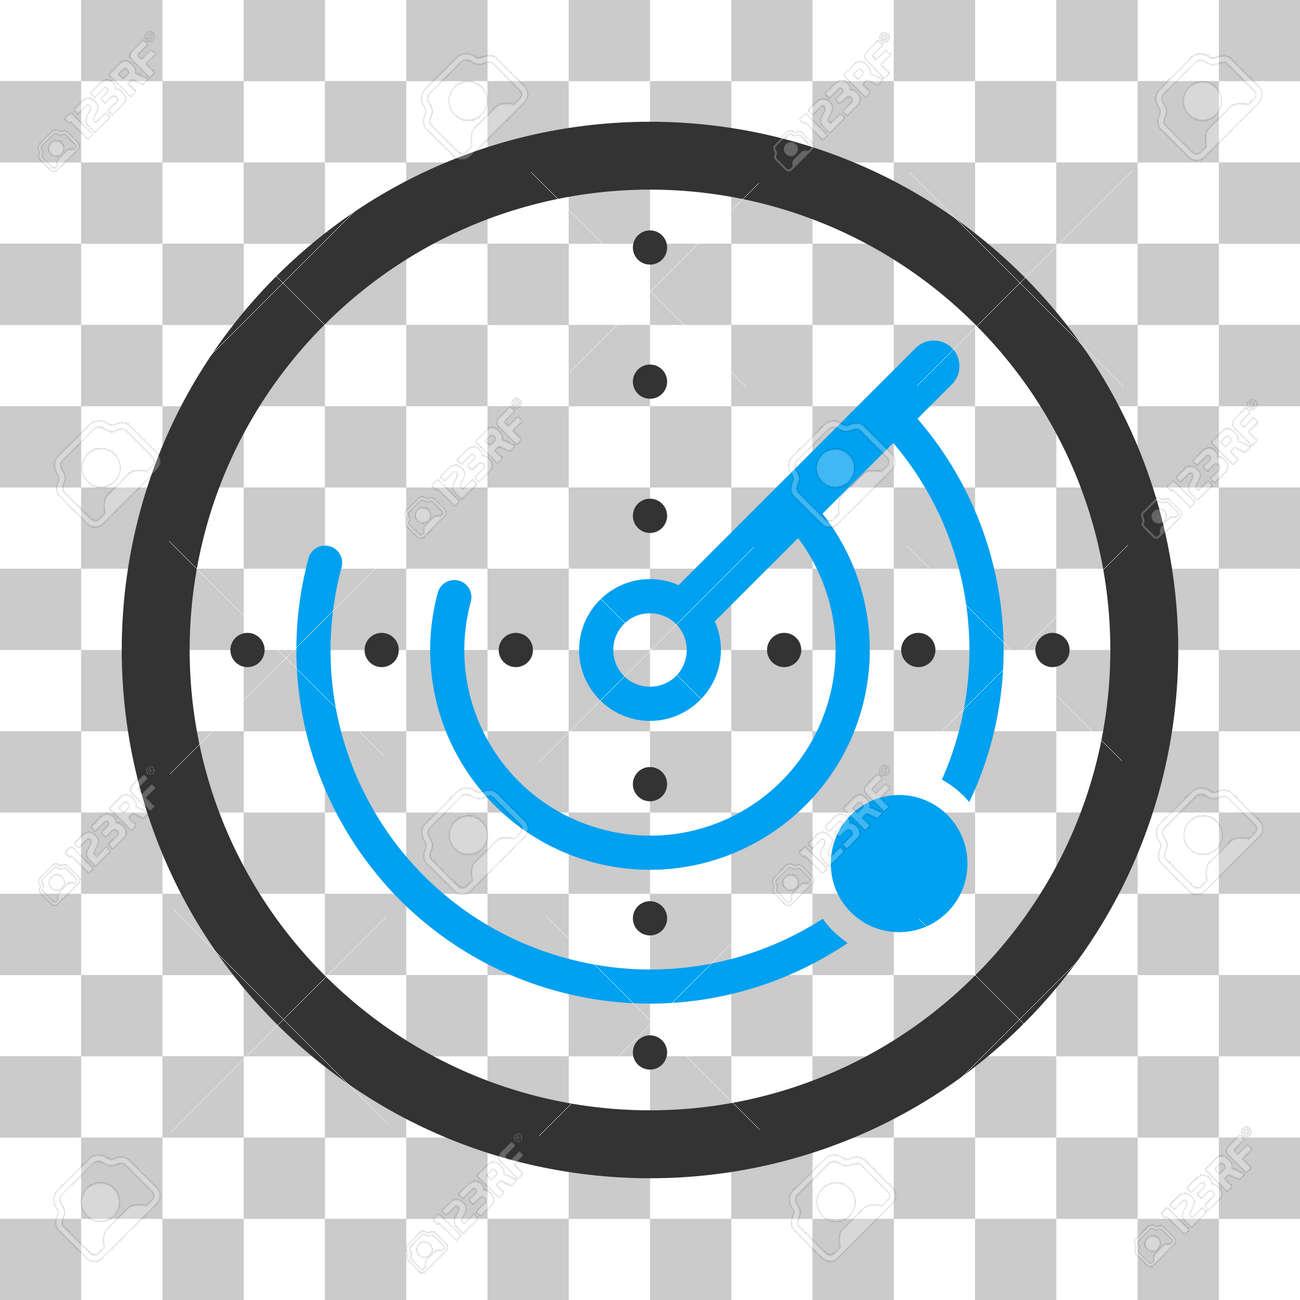 Radar Vector Icon Illustration Style Is Flat Iconic Bicolor